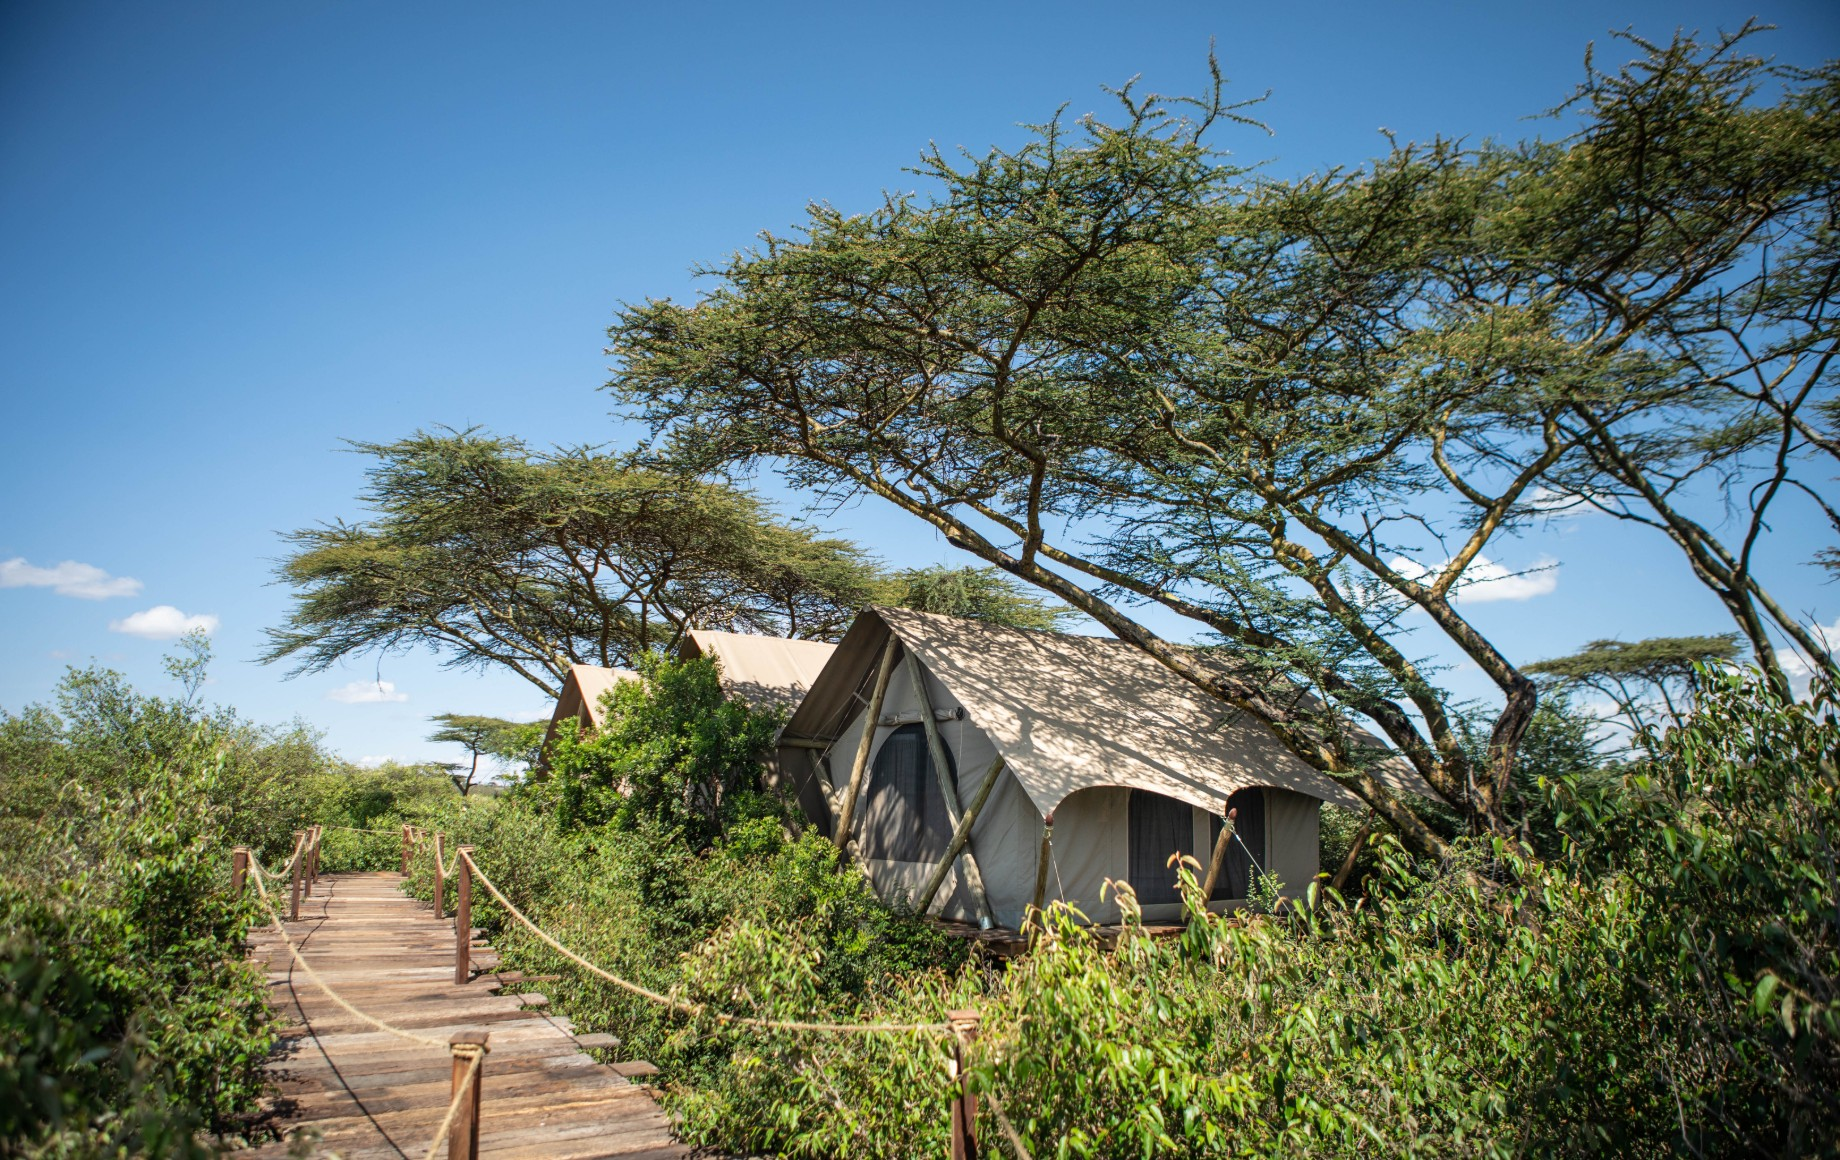 a tent surrounded by greenery at Mara Nyika